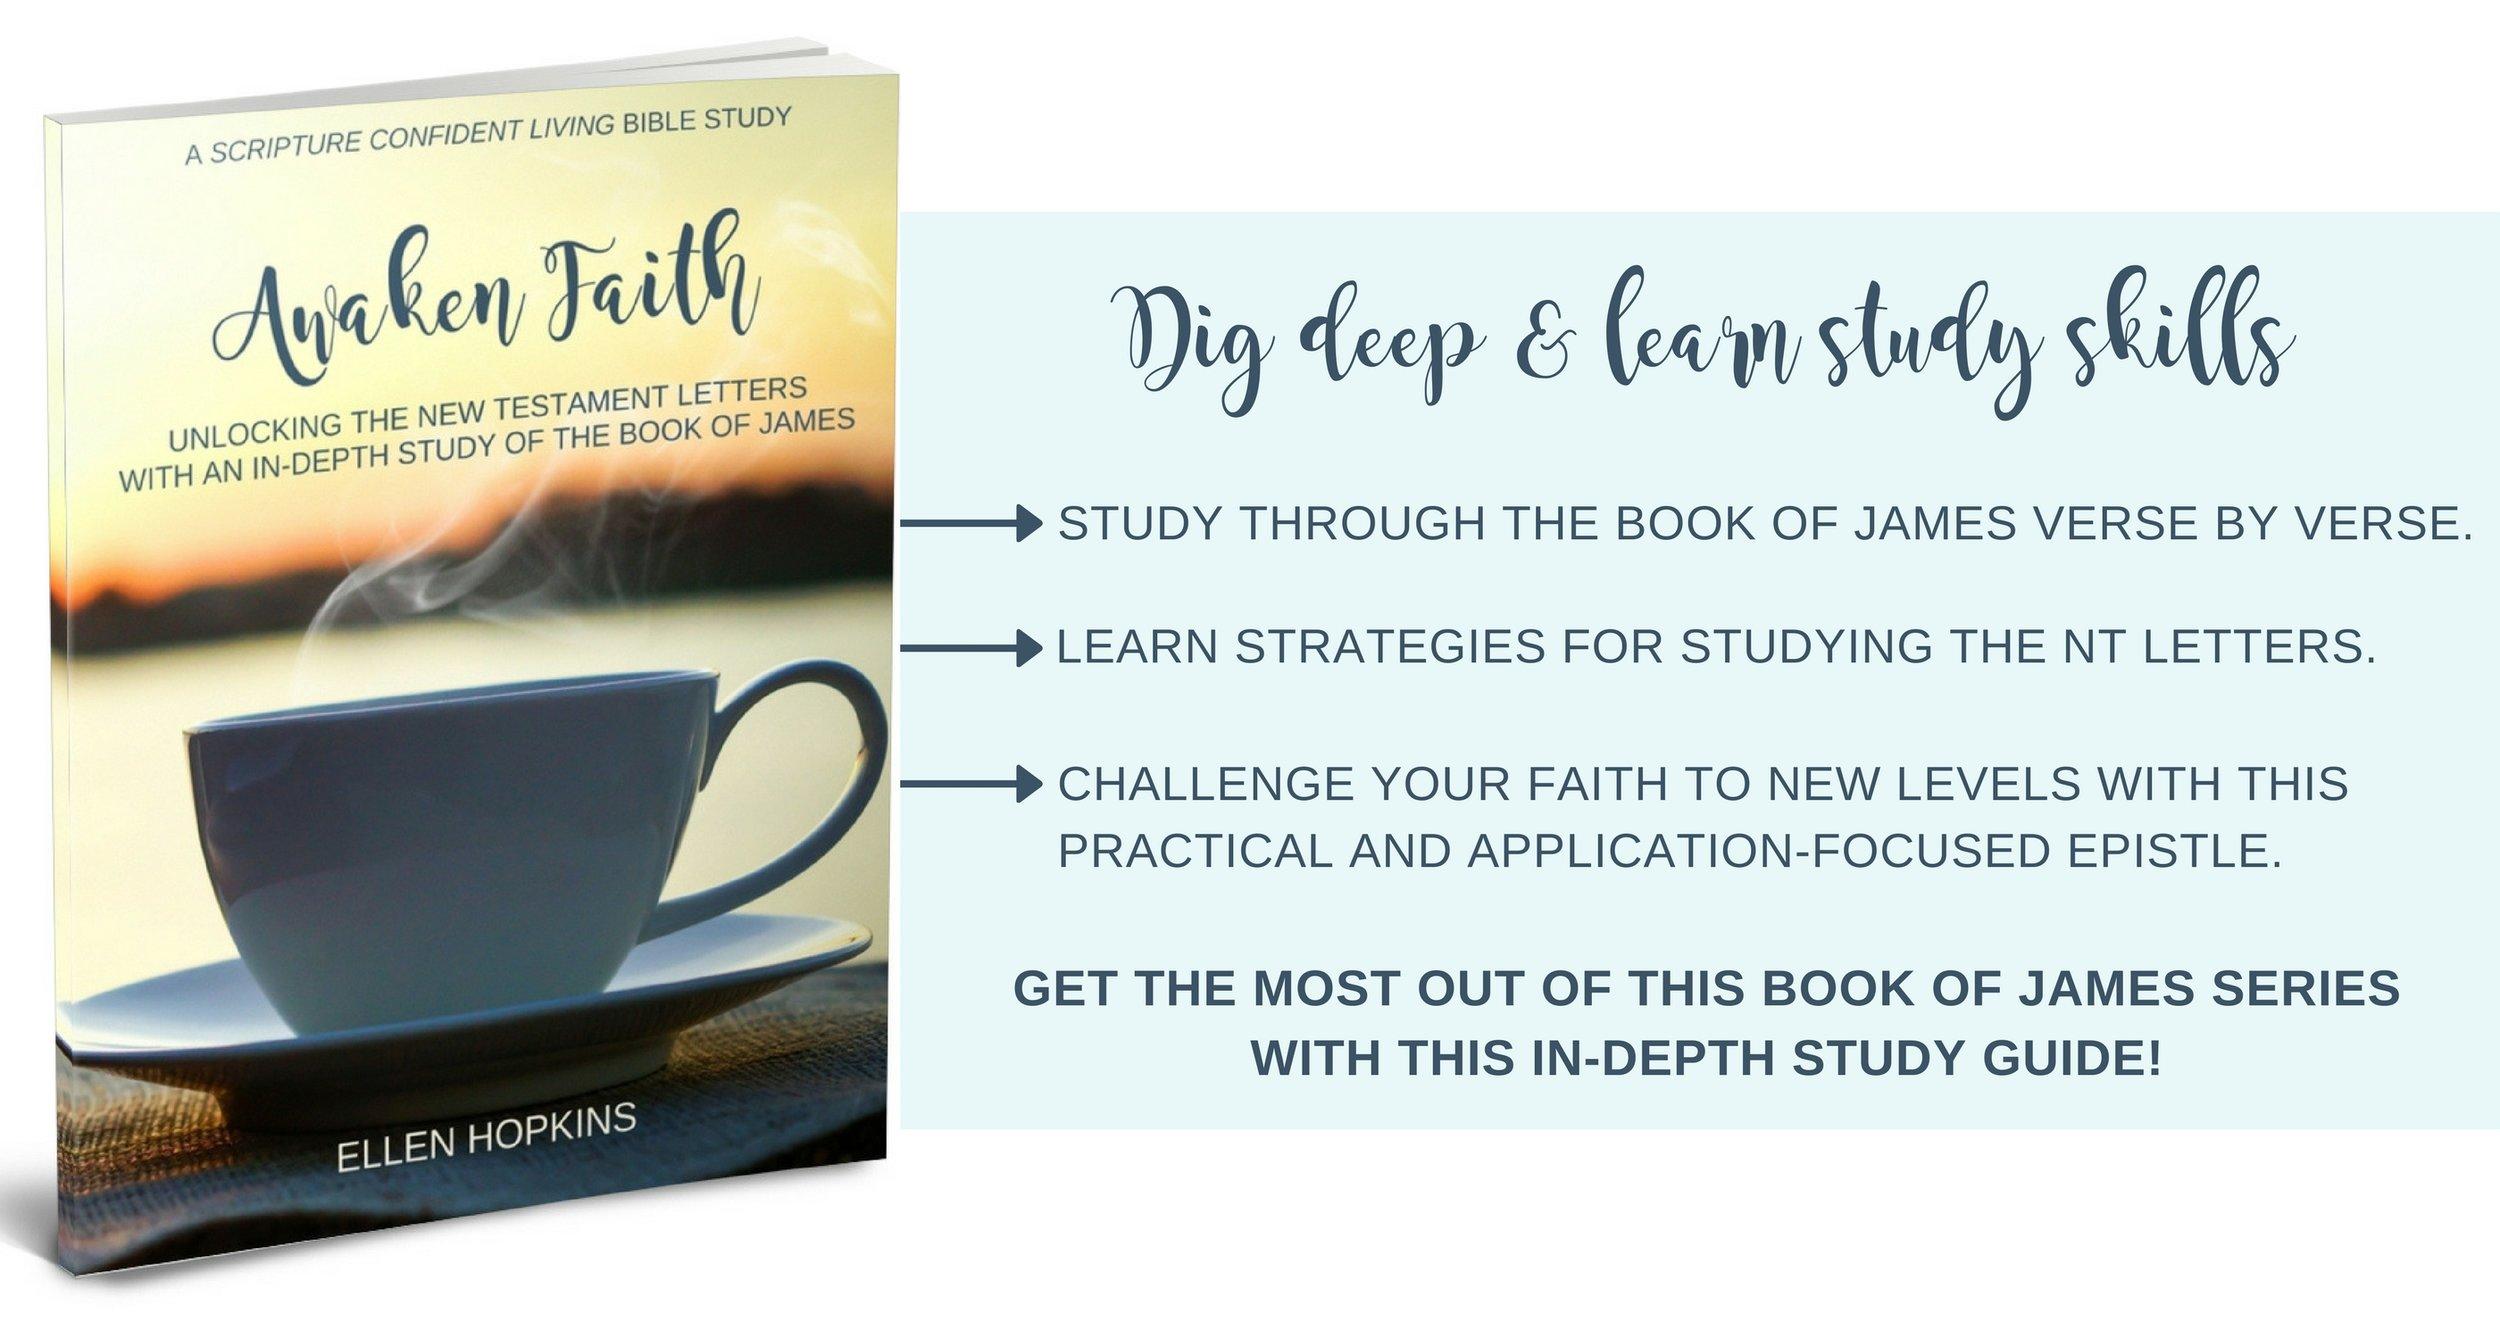 James-Bible-Study-Guide.jpg